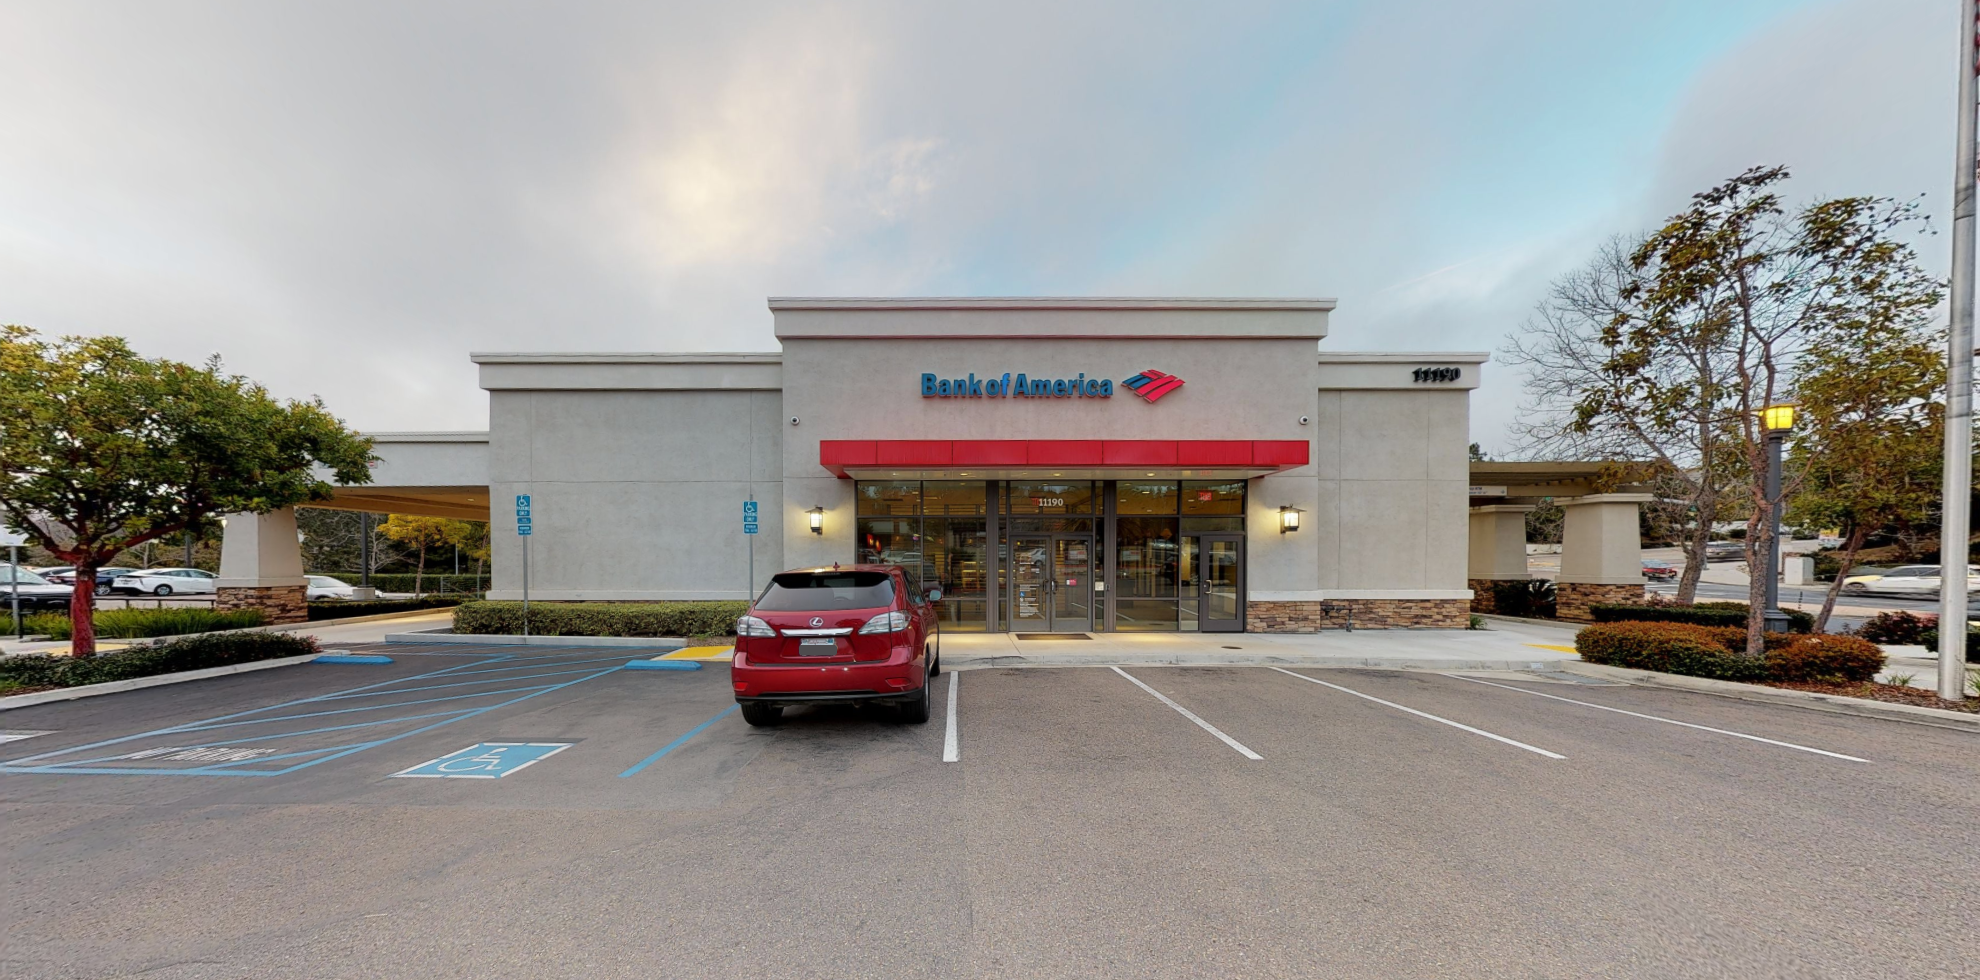 Bank of America financial center with drive-thru ATM   11190 E Ocean Air Dr, San Diego, CA 92130